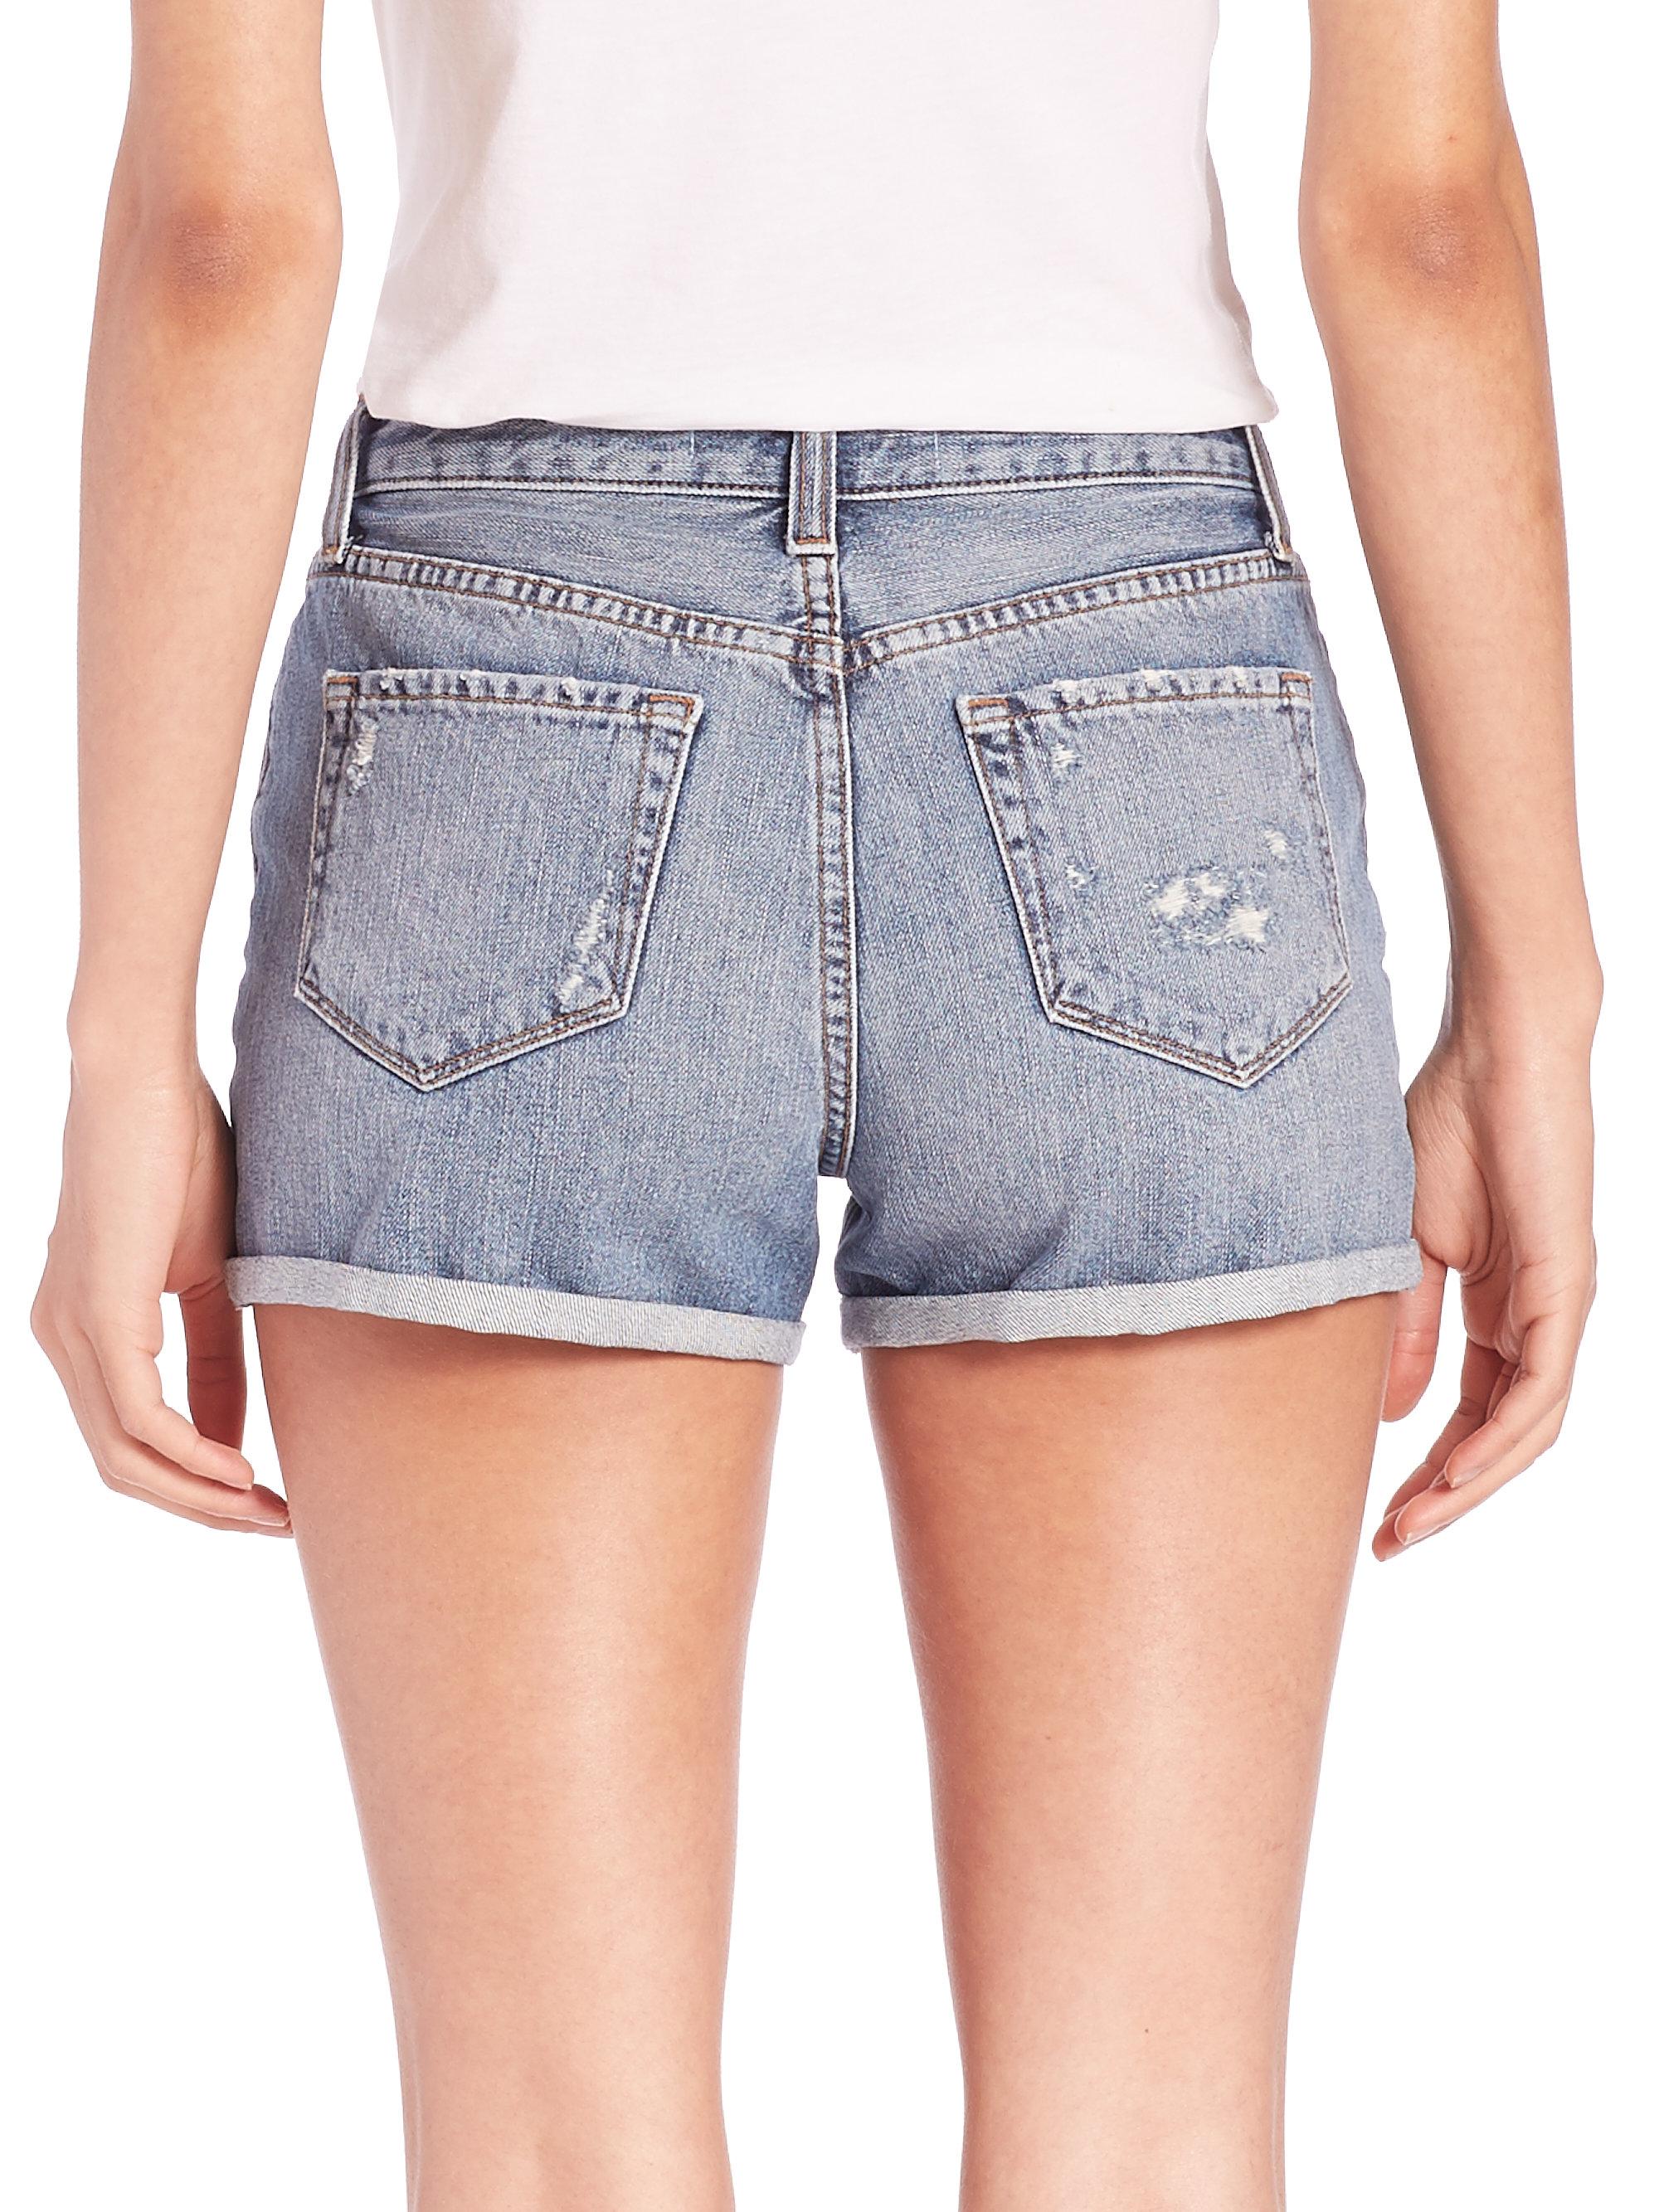 Womens Gracie High-Rise Denim Shorts J Brand 39F0Cy